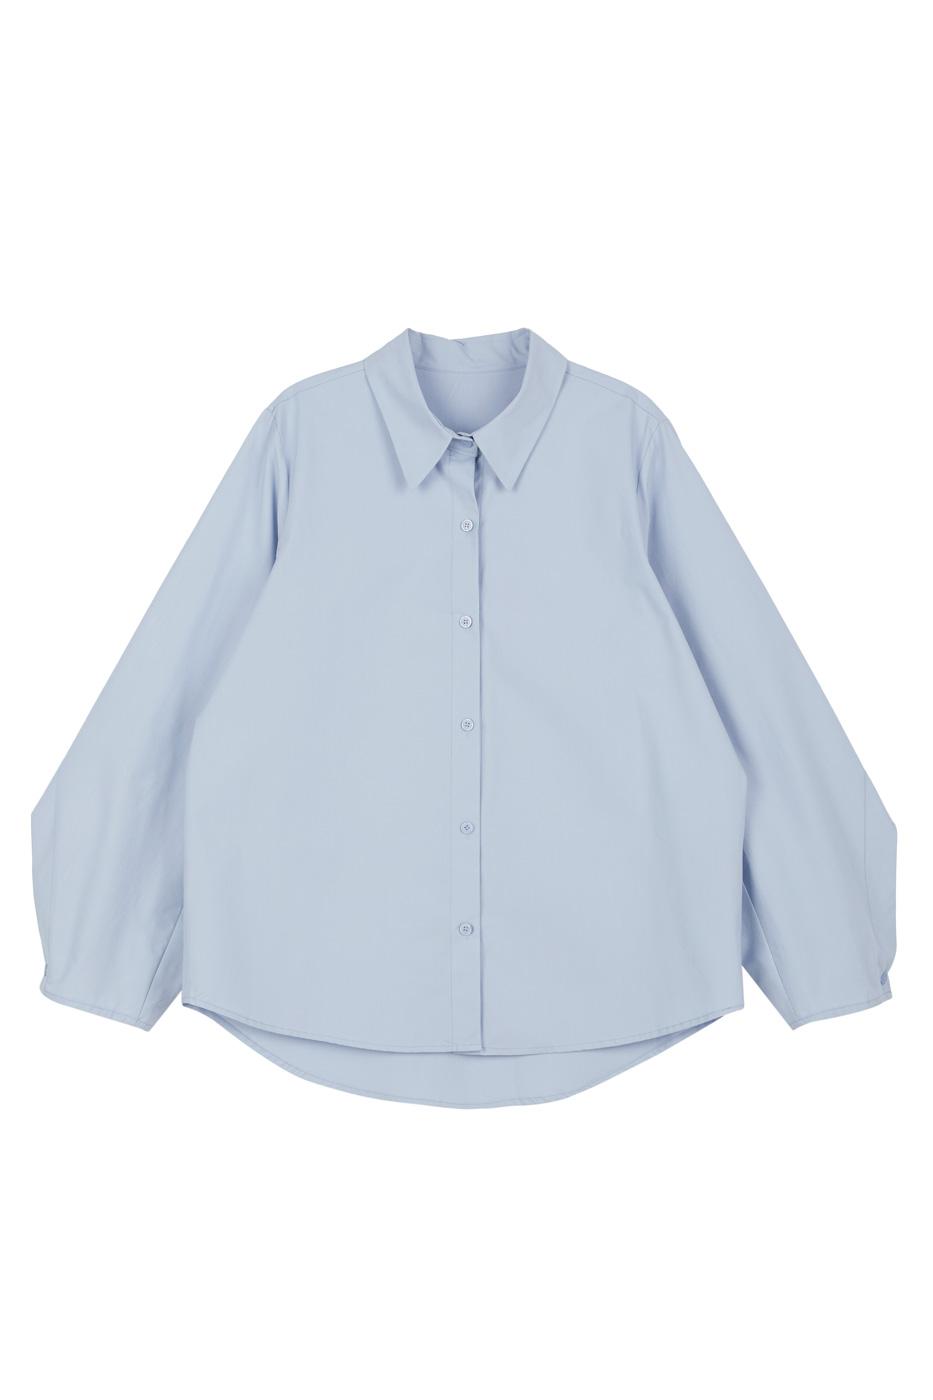 Louis balloon cotton shirt